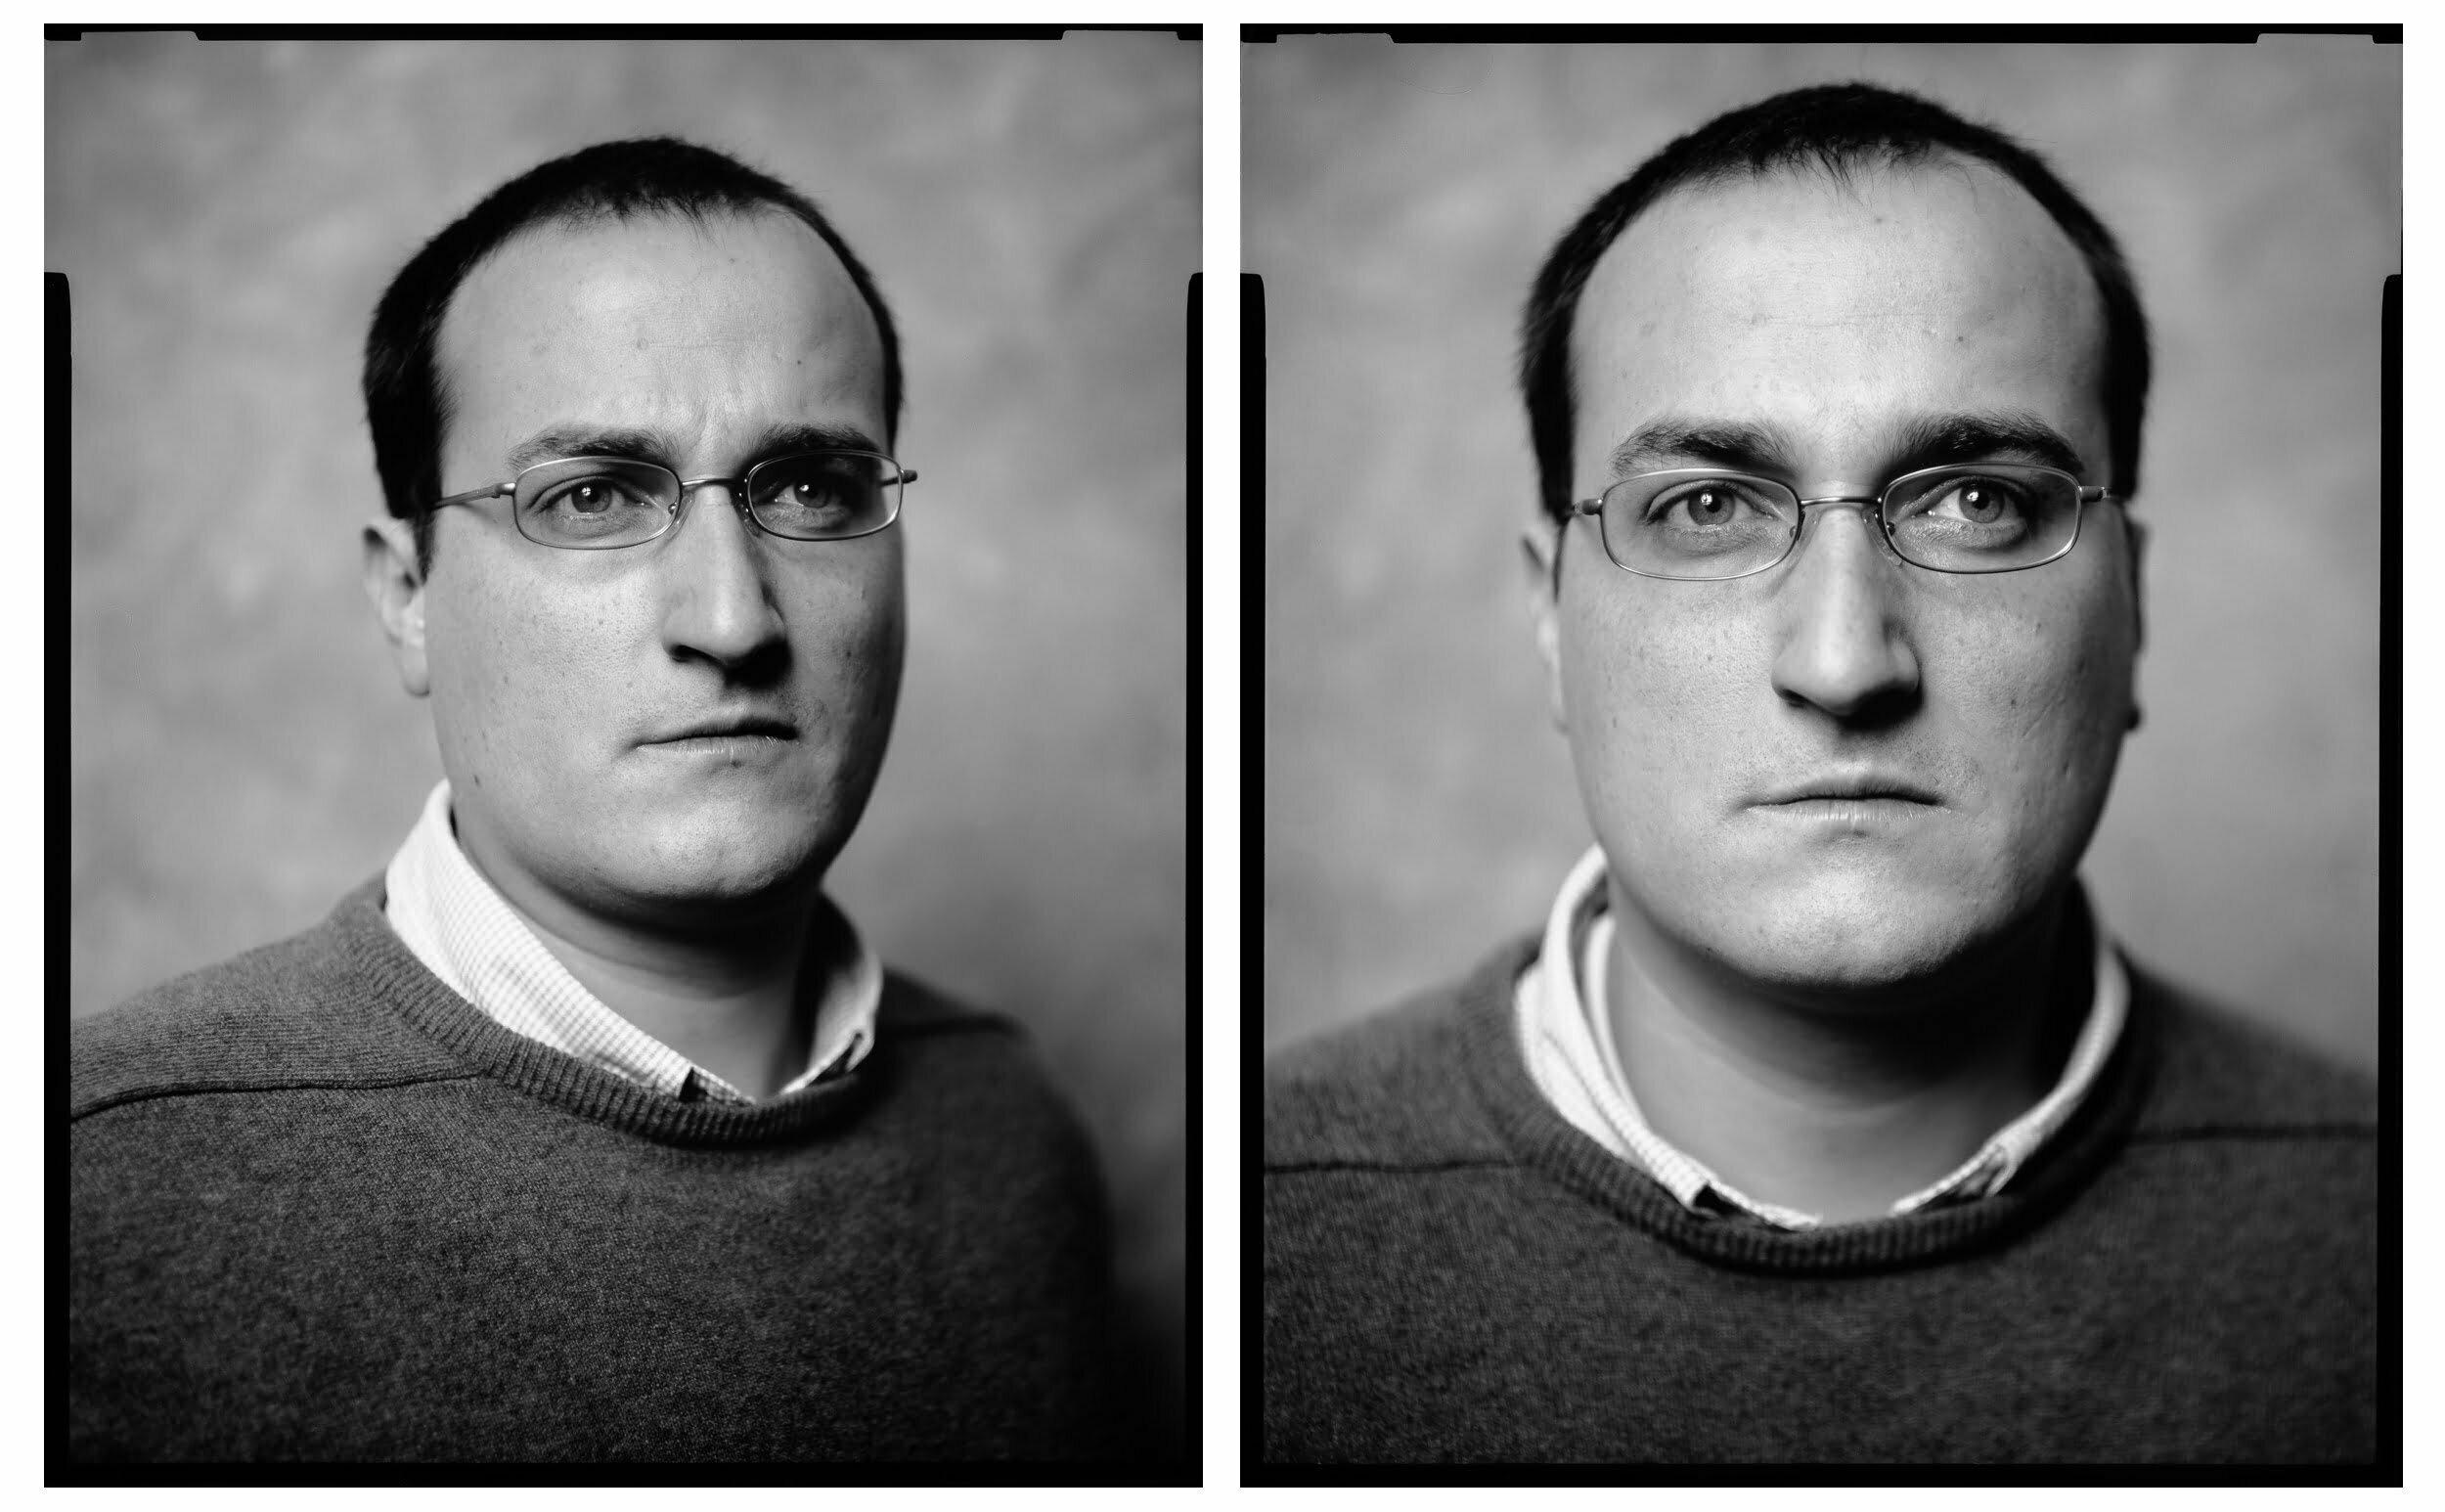 Portrait of Xavier, Statistician